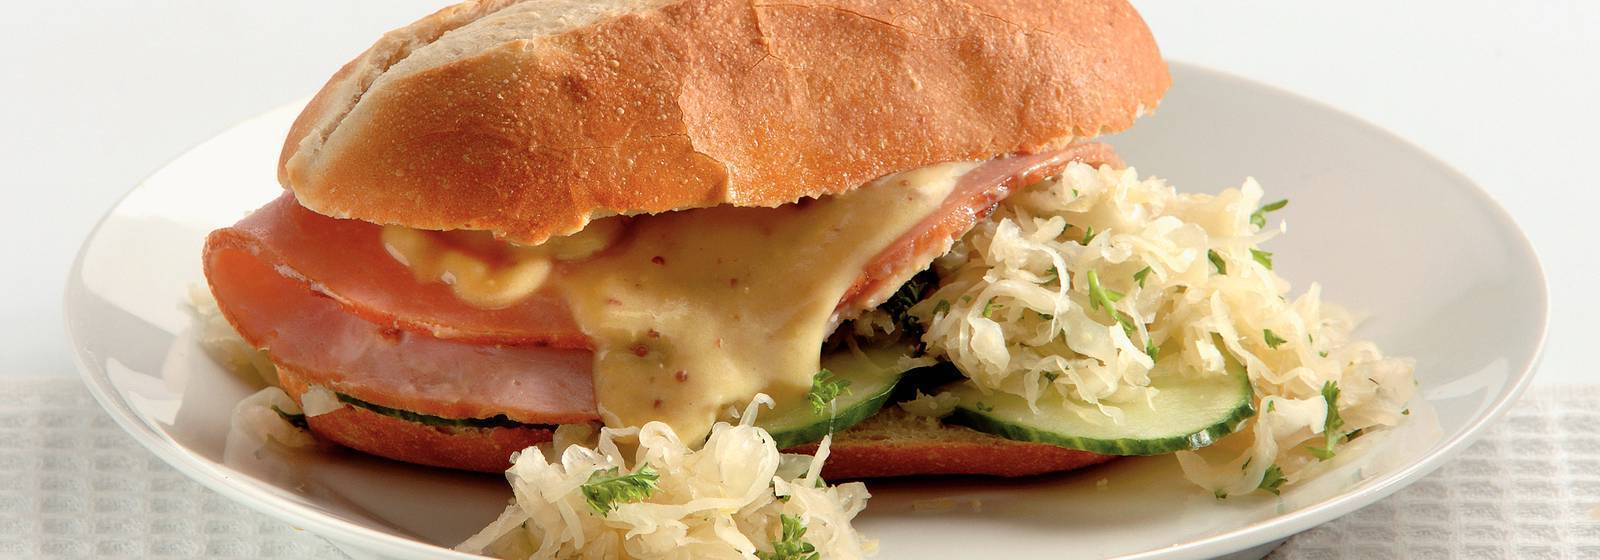 Roll of ham with hot sauerkraut